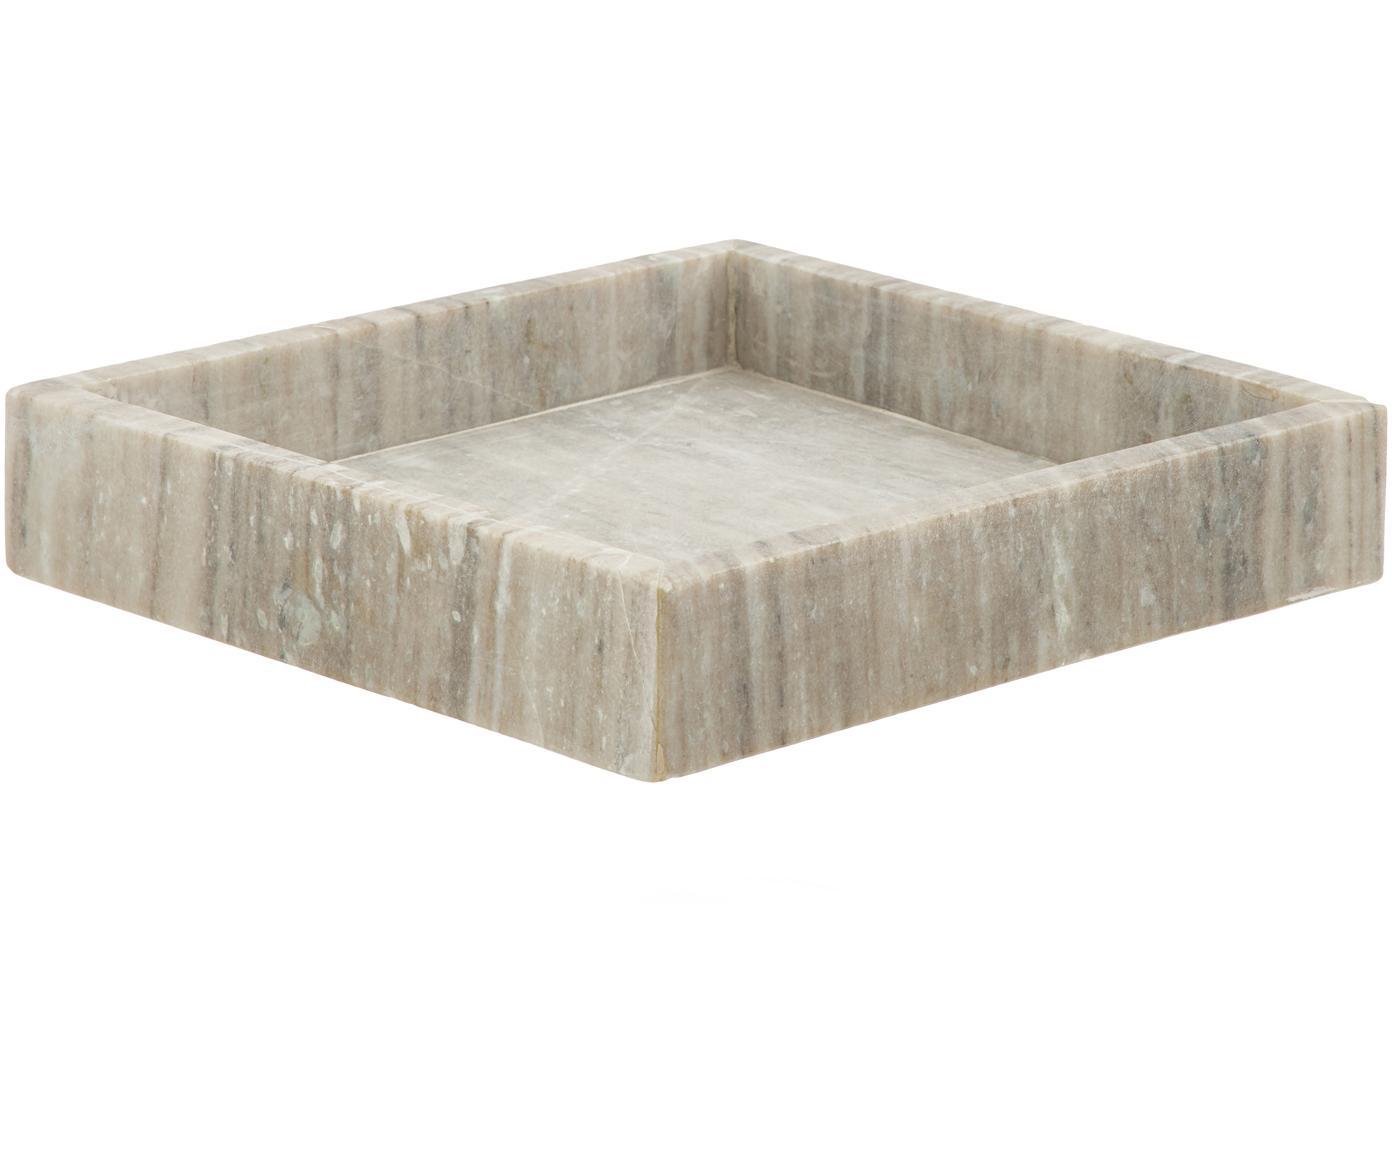 Vassoio in marmo Porter, Marmo, Taupe, Larg. 26 x Prof. 26 cm